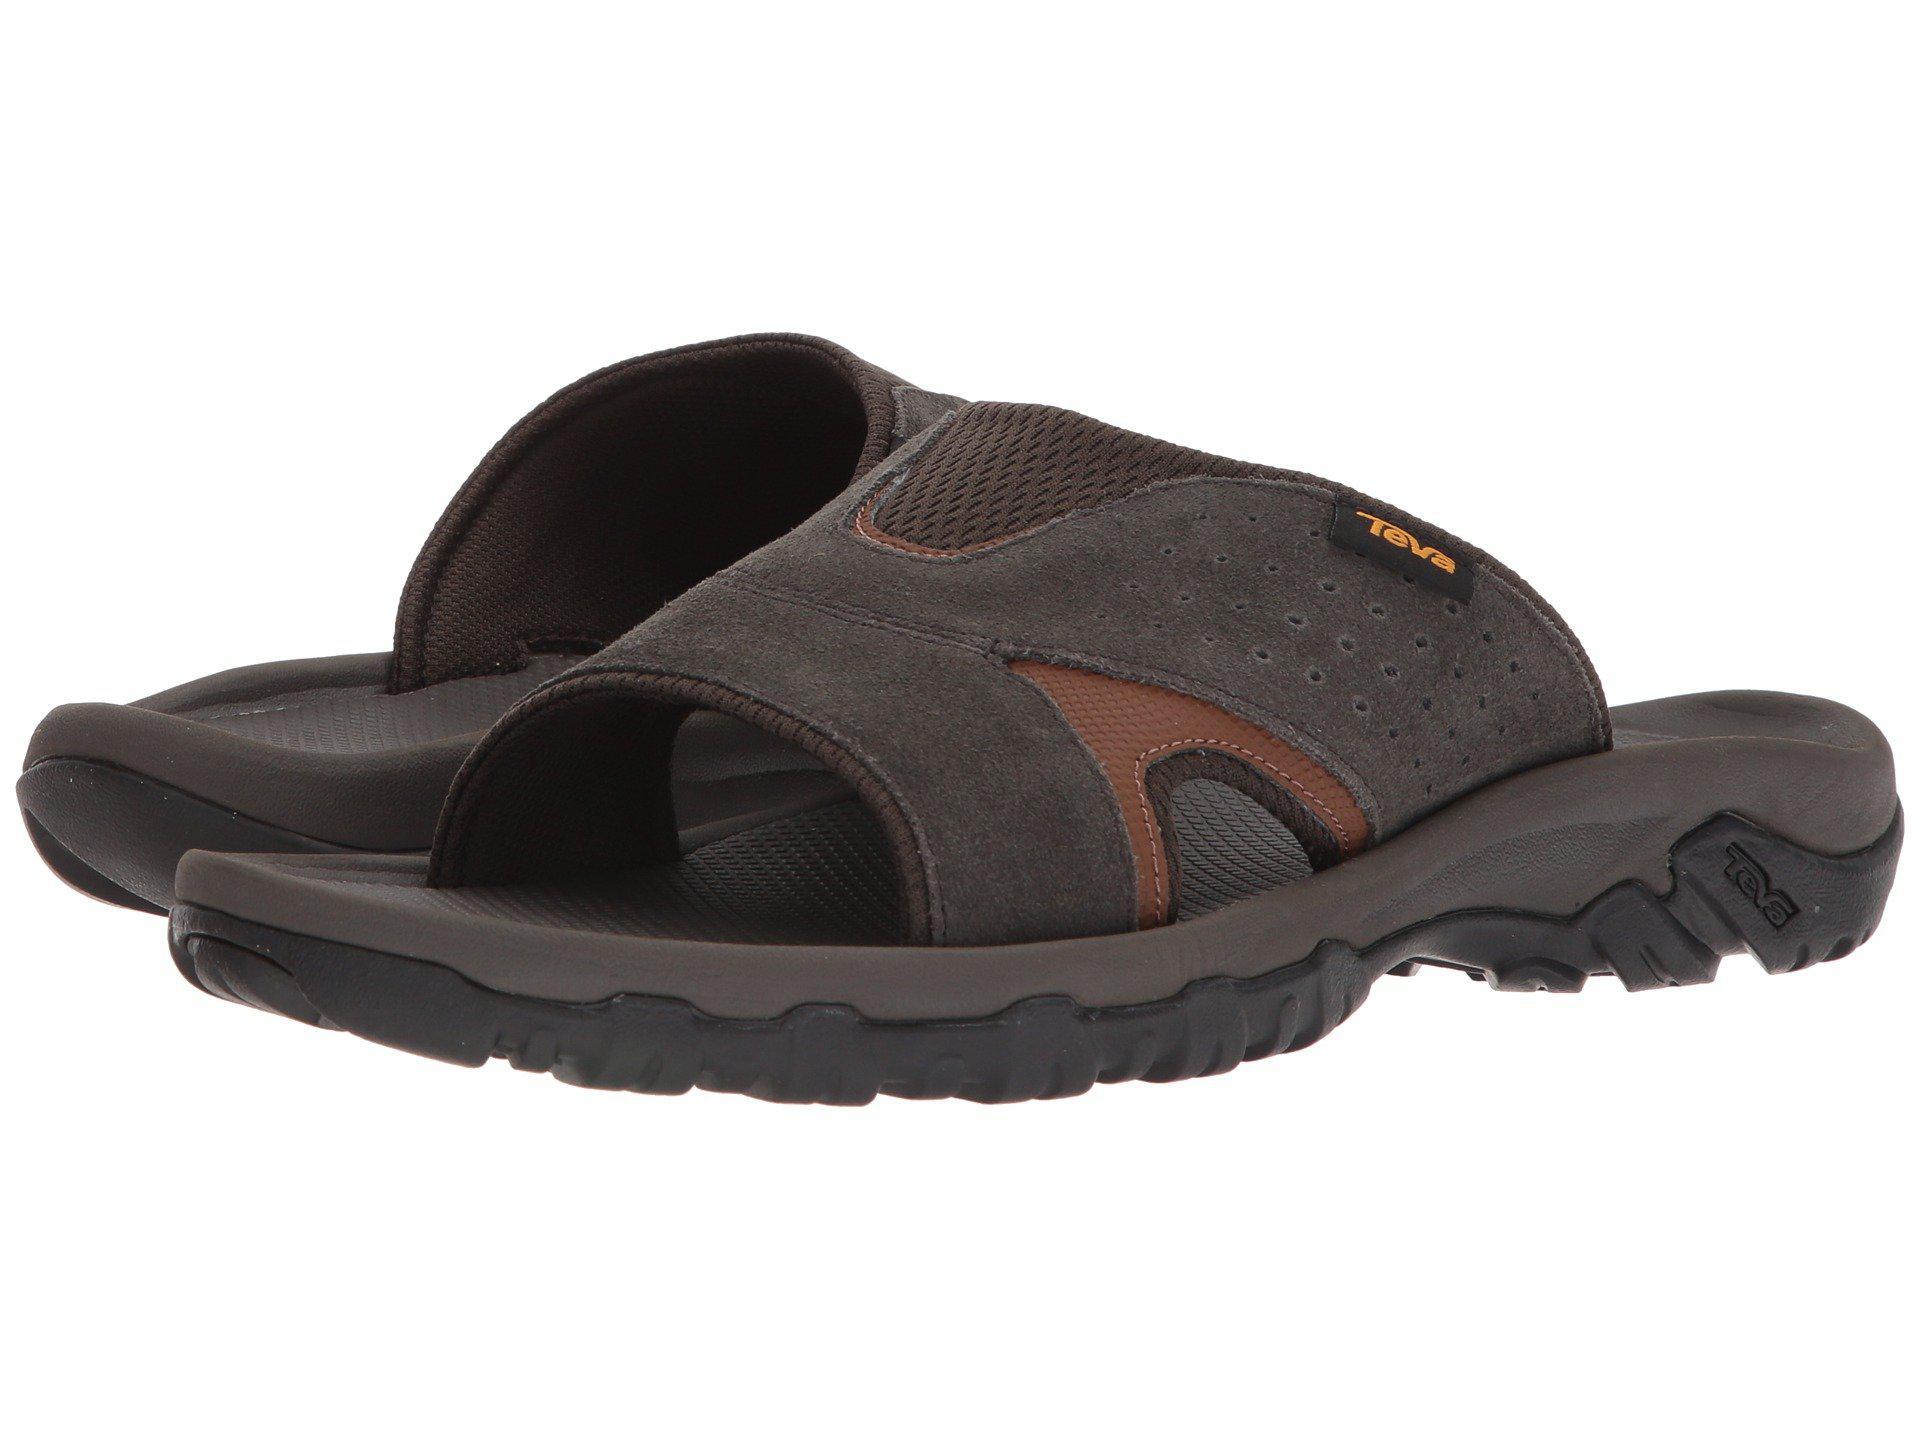 7190ee4ffc7a Lyst - Teva Katavi 2 Slide (bungee Cord) Men s Slide Shoes for Men